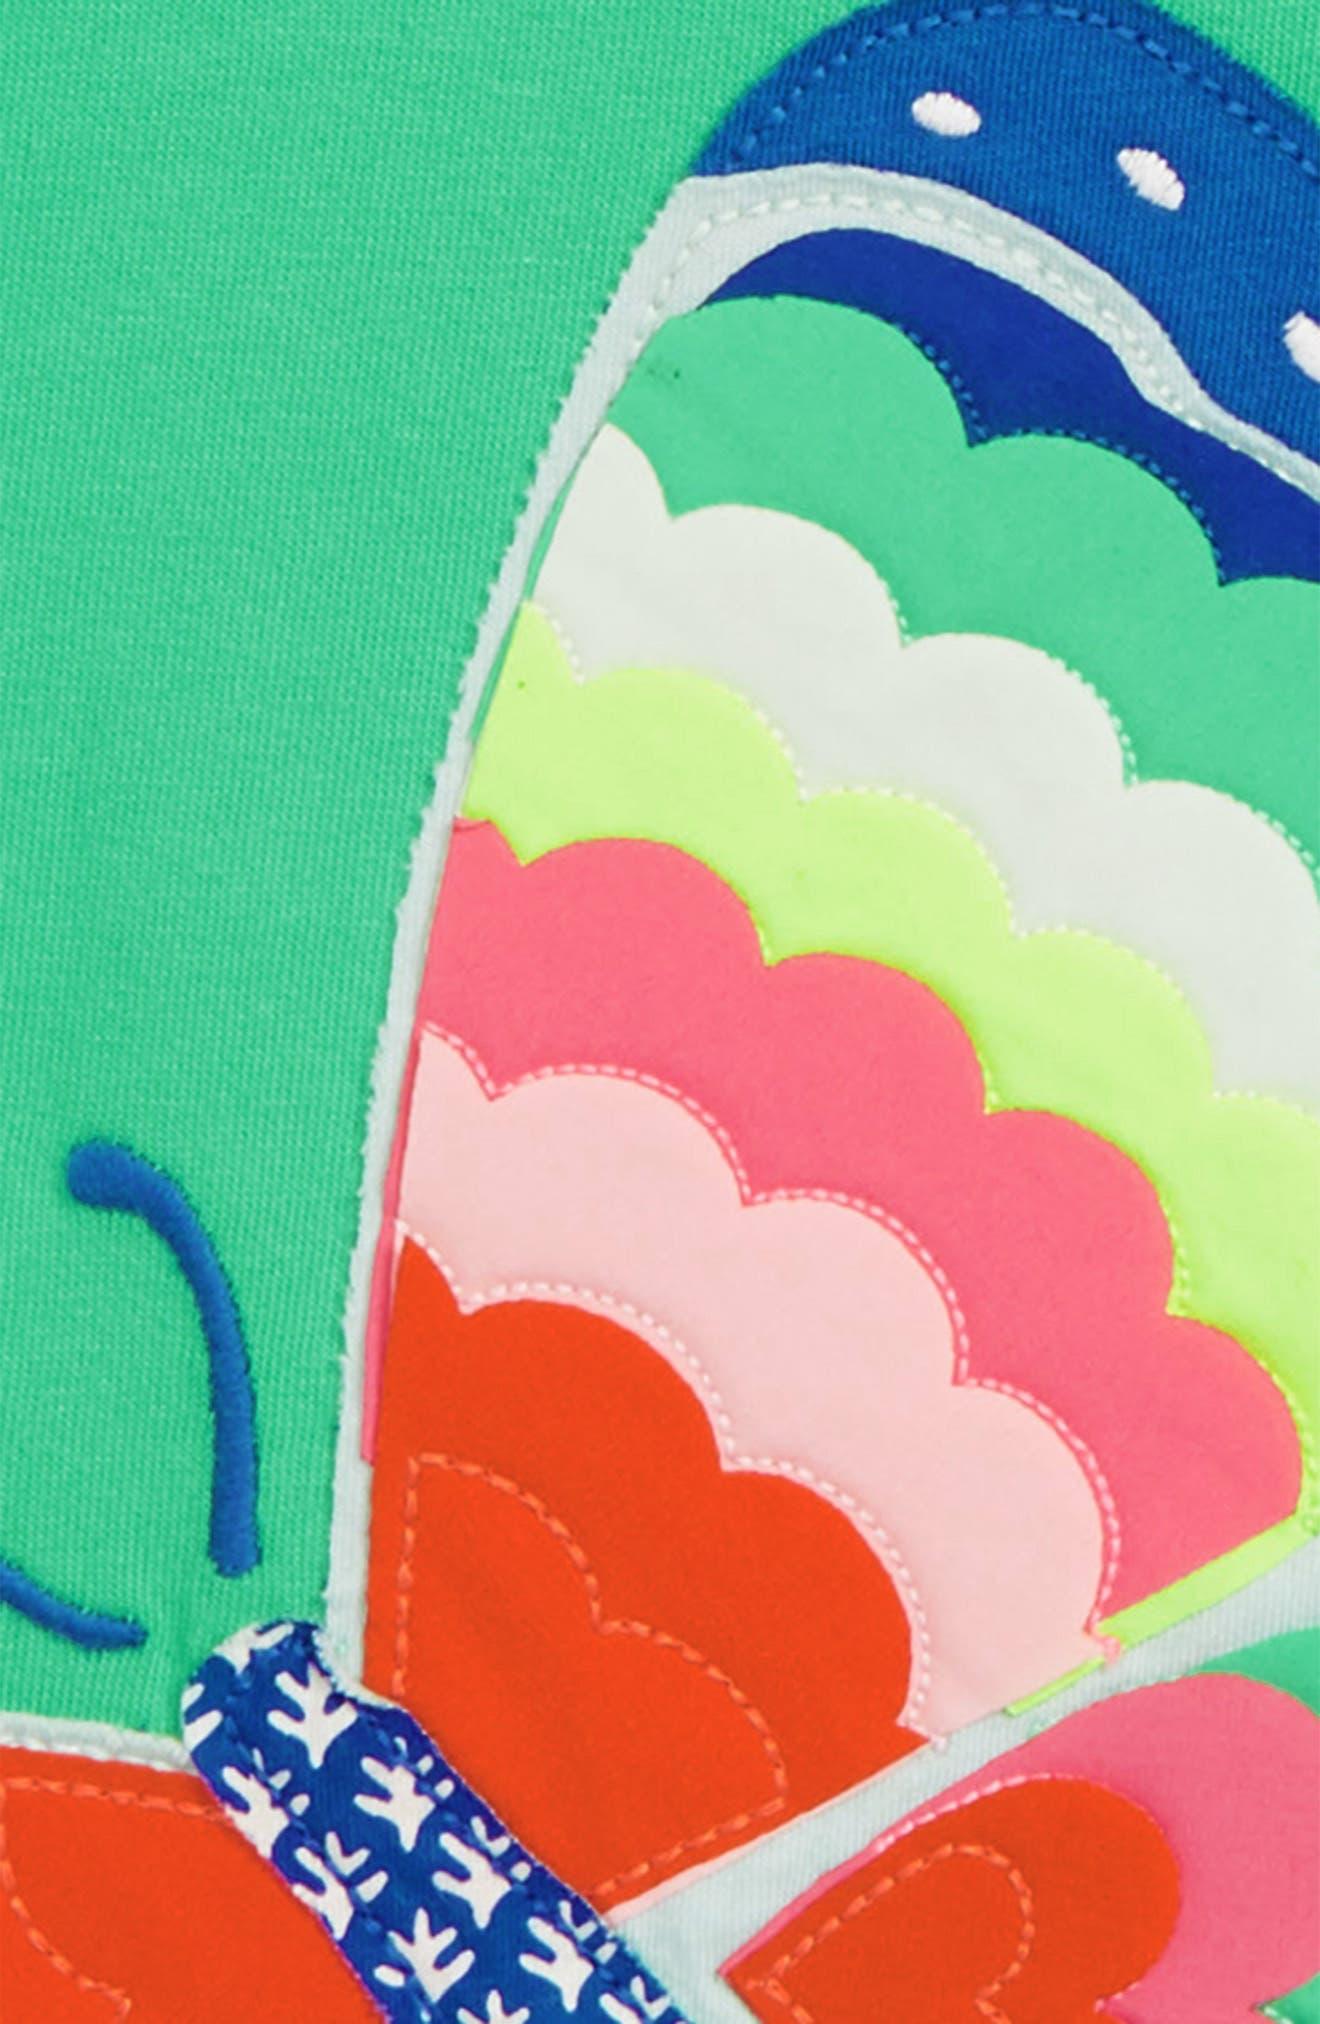 Summer Interest Butterfly Appliqué Tee,                             Alternate thumbnail 2, color,                             Peppermint Green Butterfly